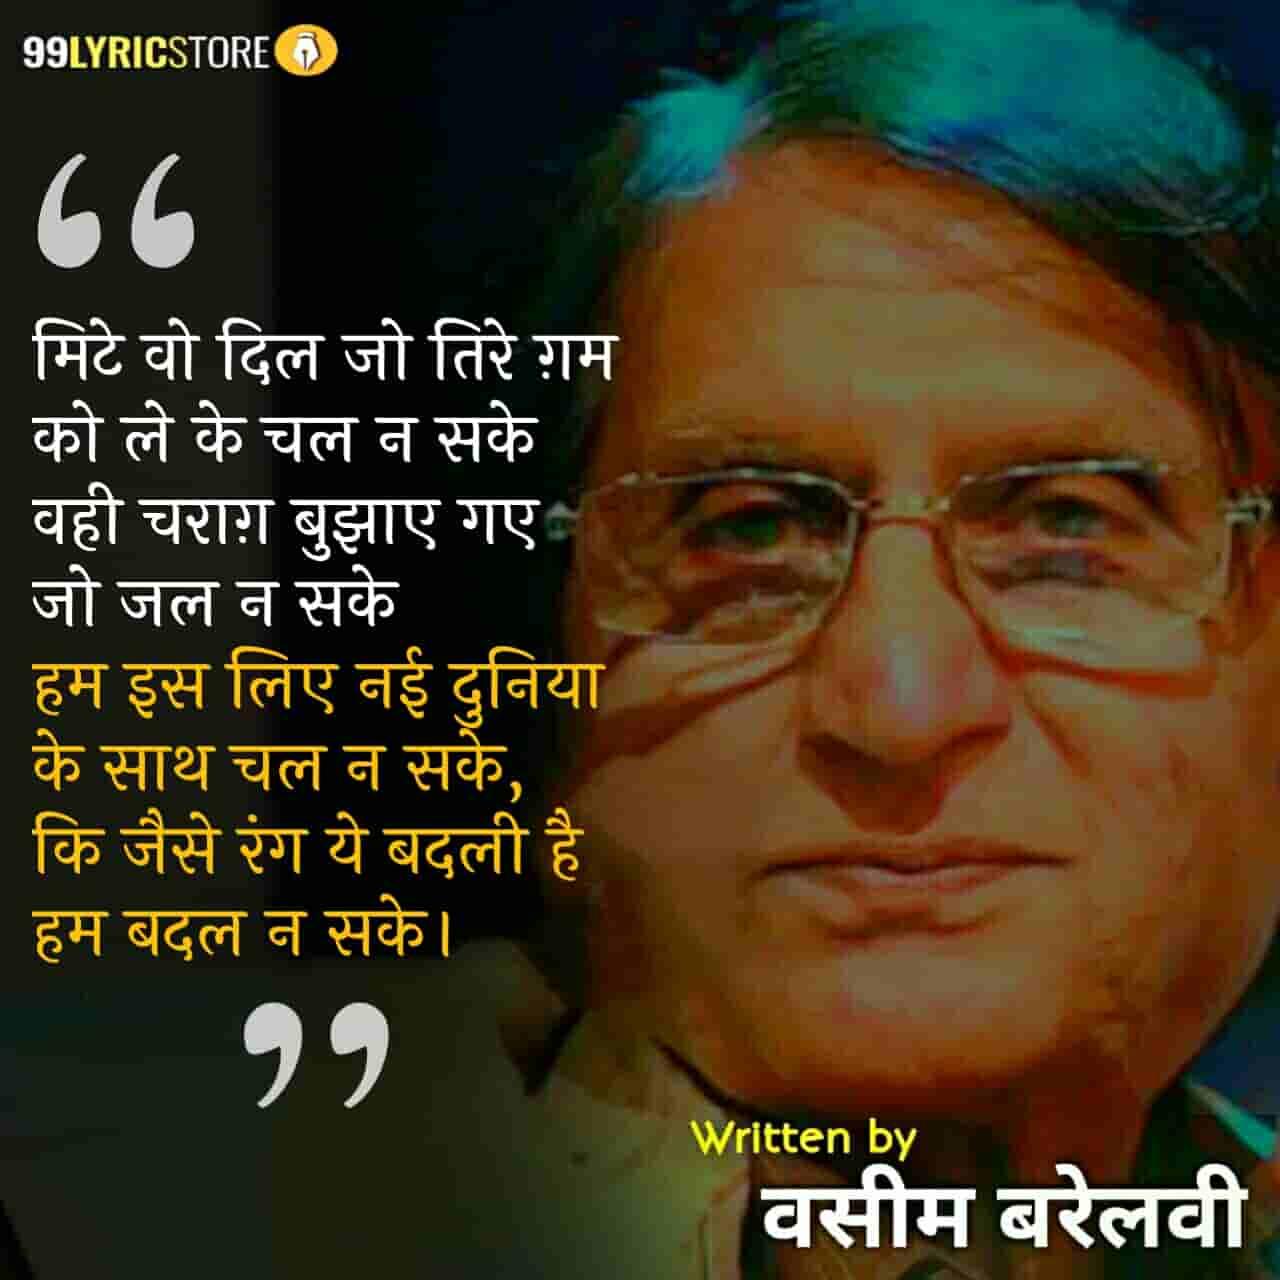 This beautiful ghazal 'Mite Wo Dil Jo Tere Gham Ko Le Ke Chal Na Sake' has written by Waseem Barelvi.